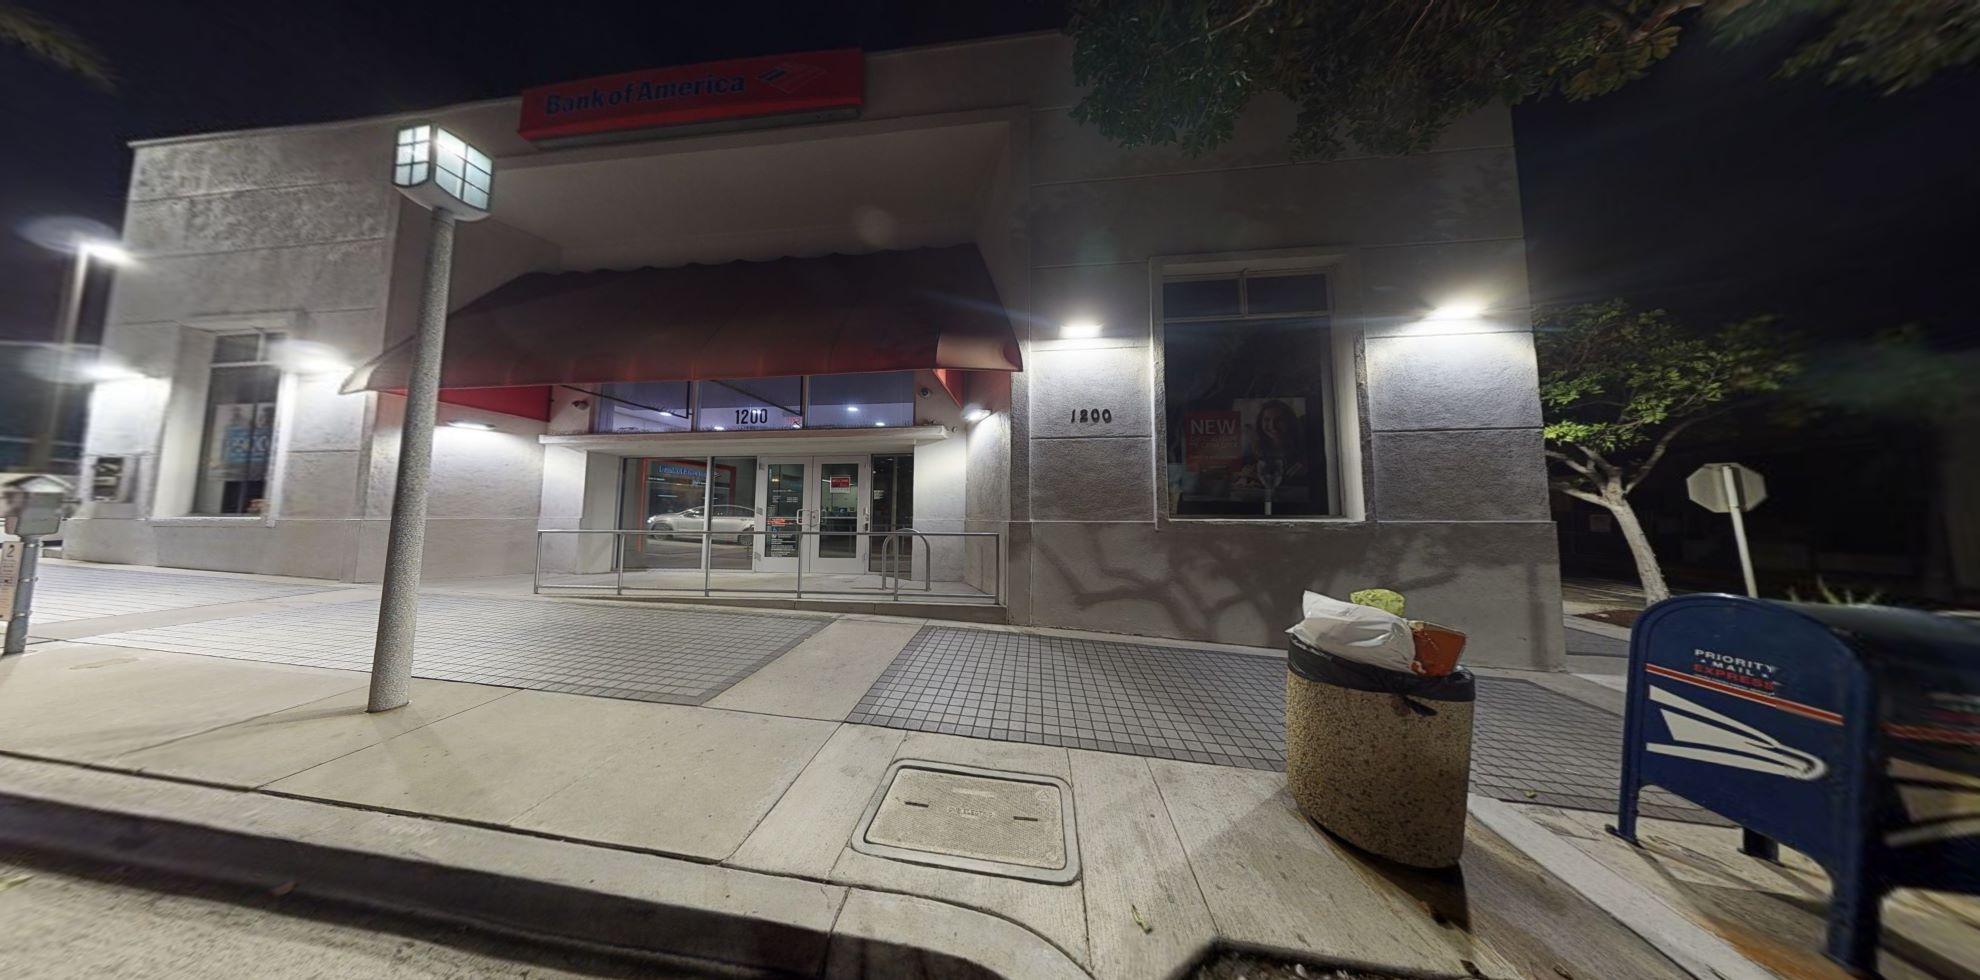 Bank of America financial center with walk-up ATM   1200 Highland Ave, Manhattan Beach, CA 90266